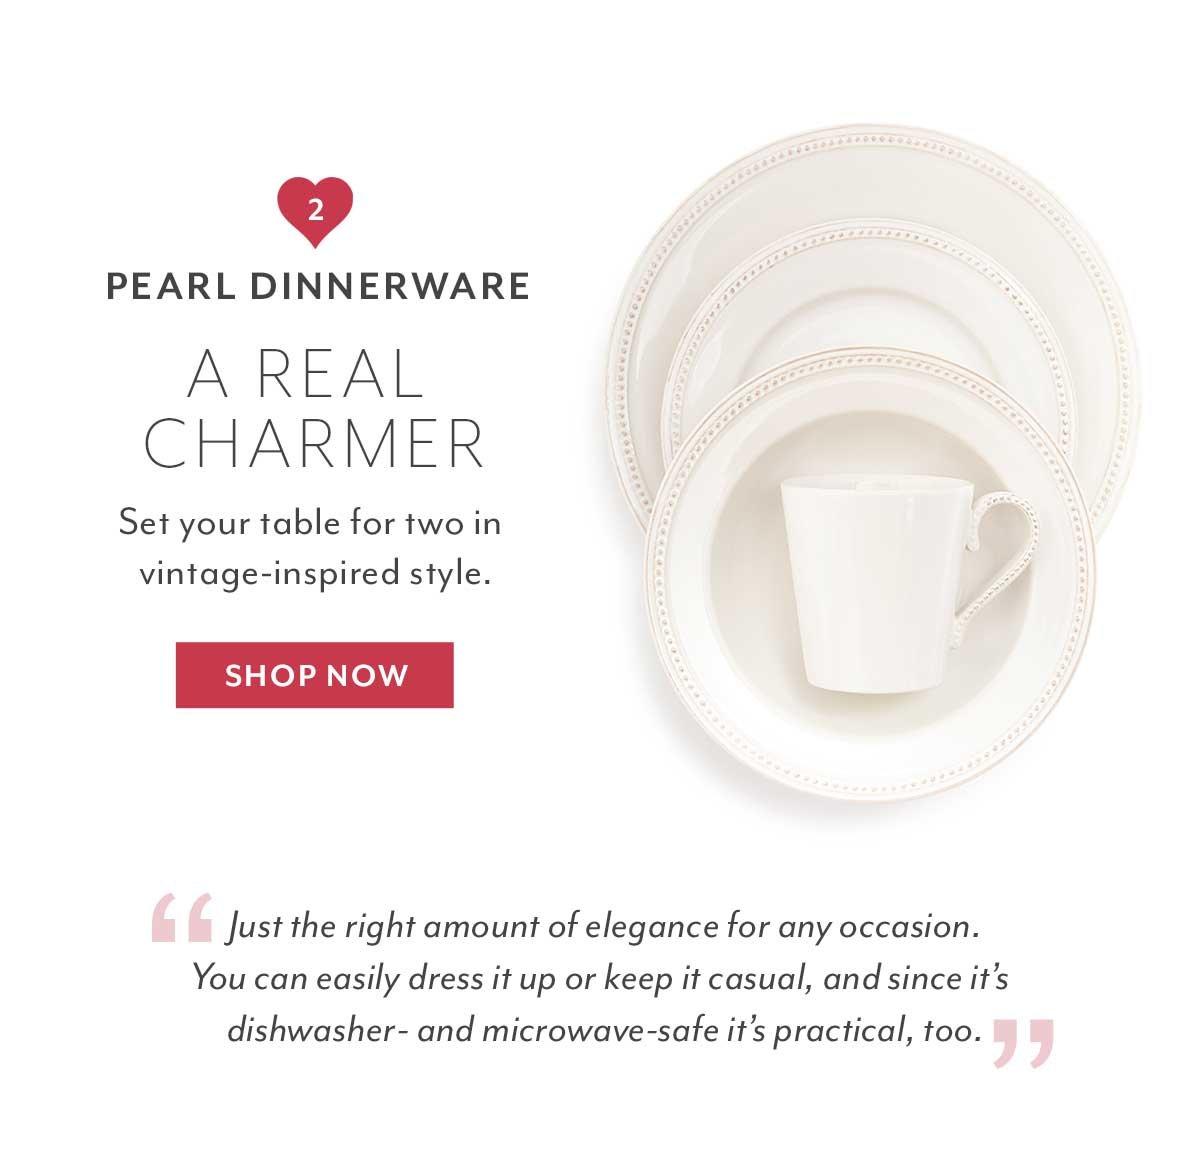 Pearl Dinnerware